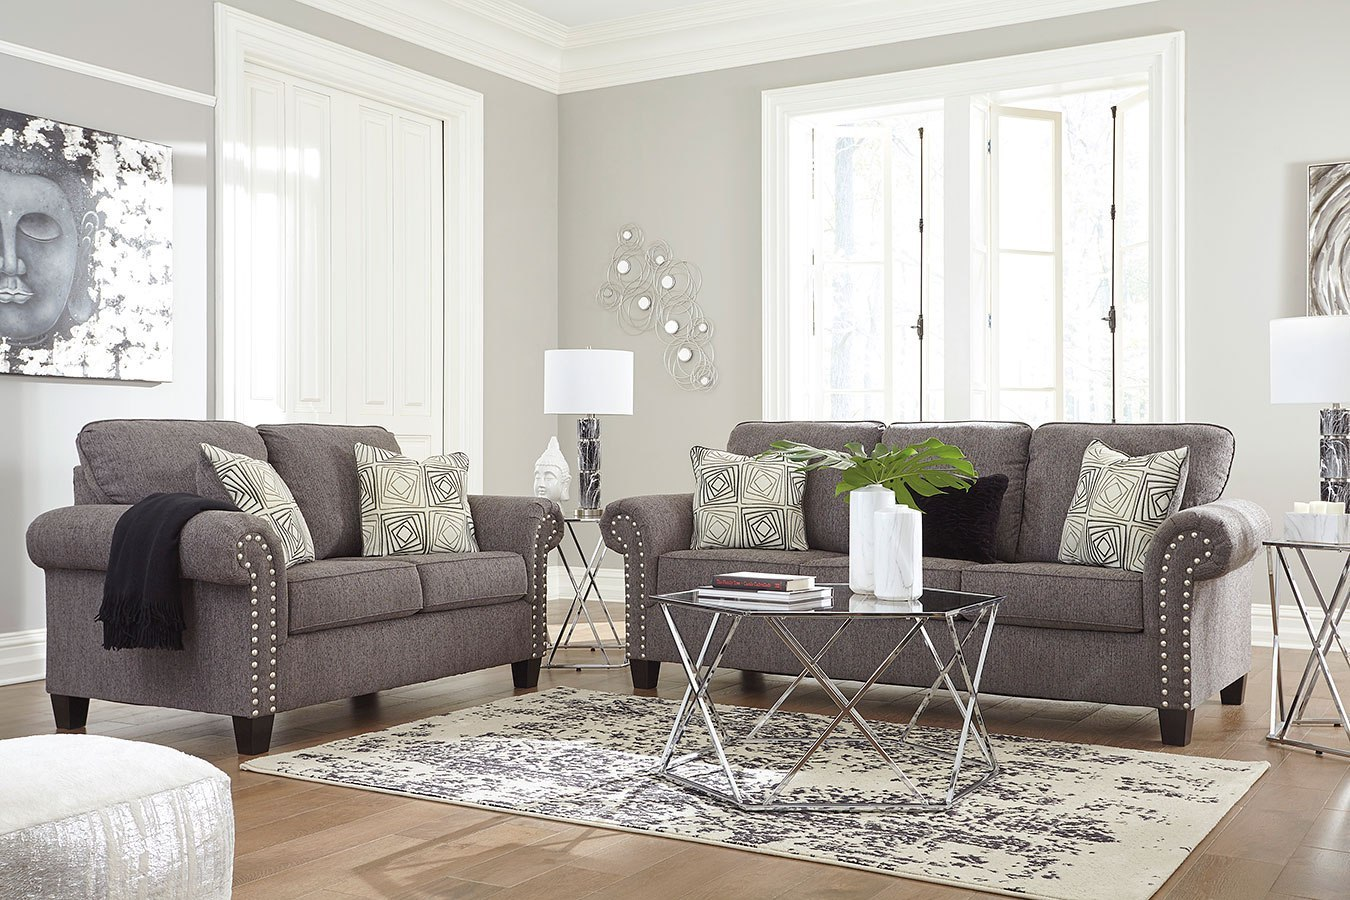 Agleno charcoal living room set benchcraft furniture cart for Charcoal living room furniture